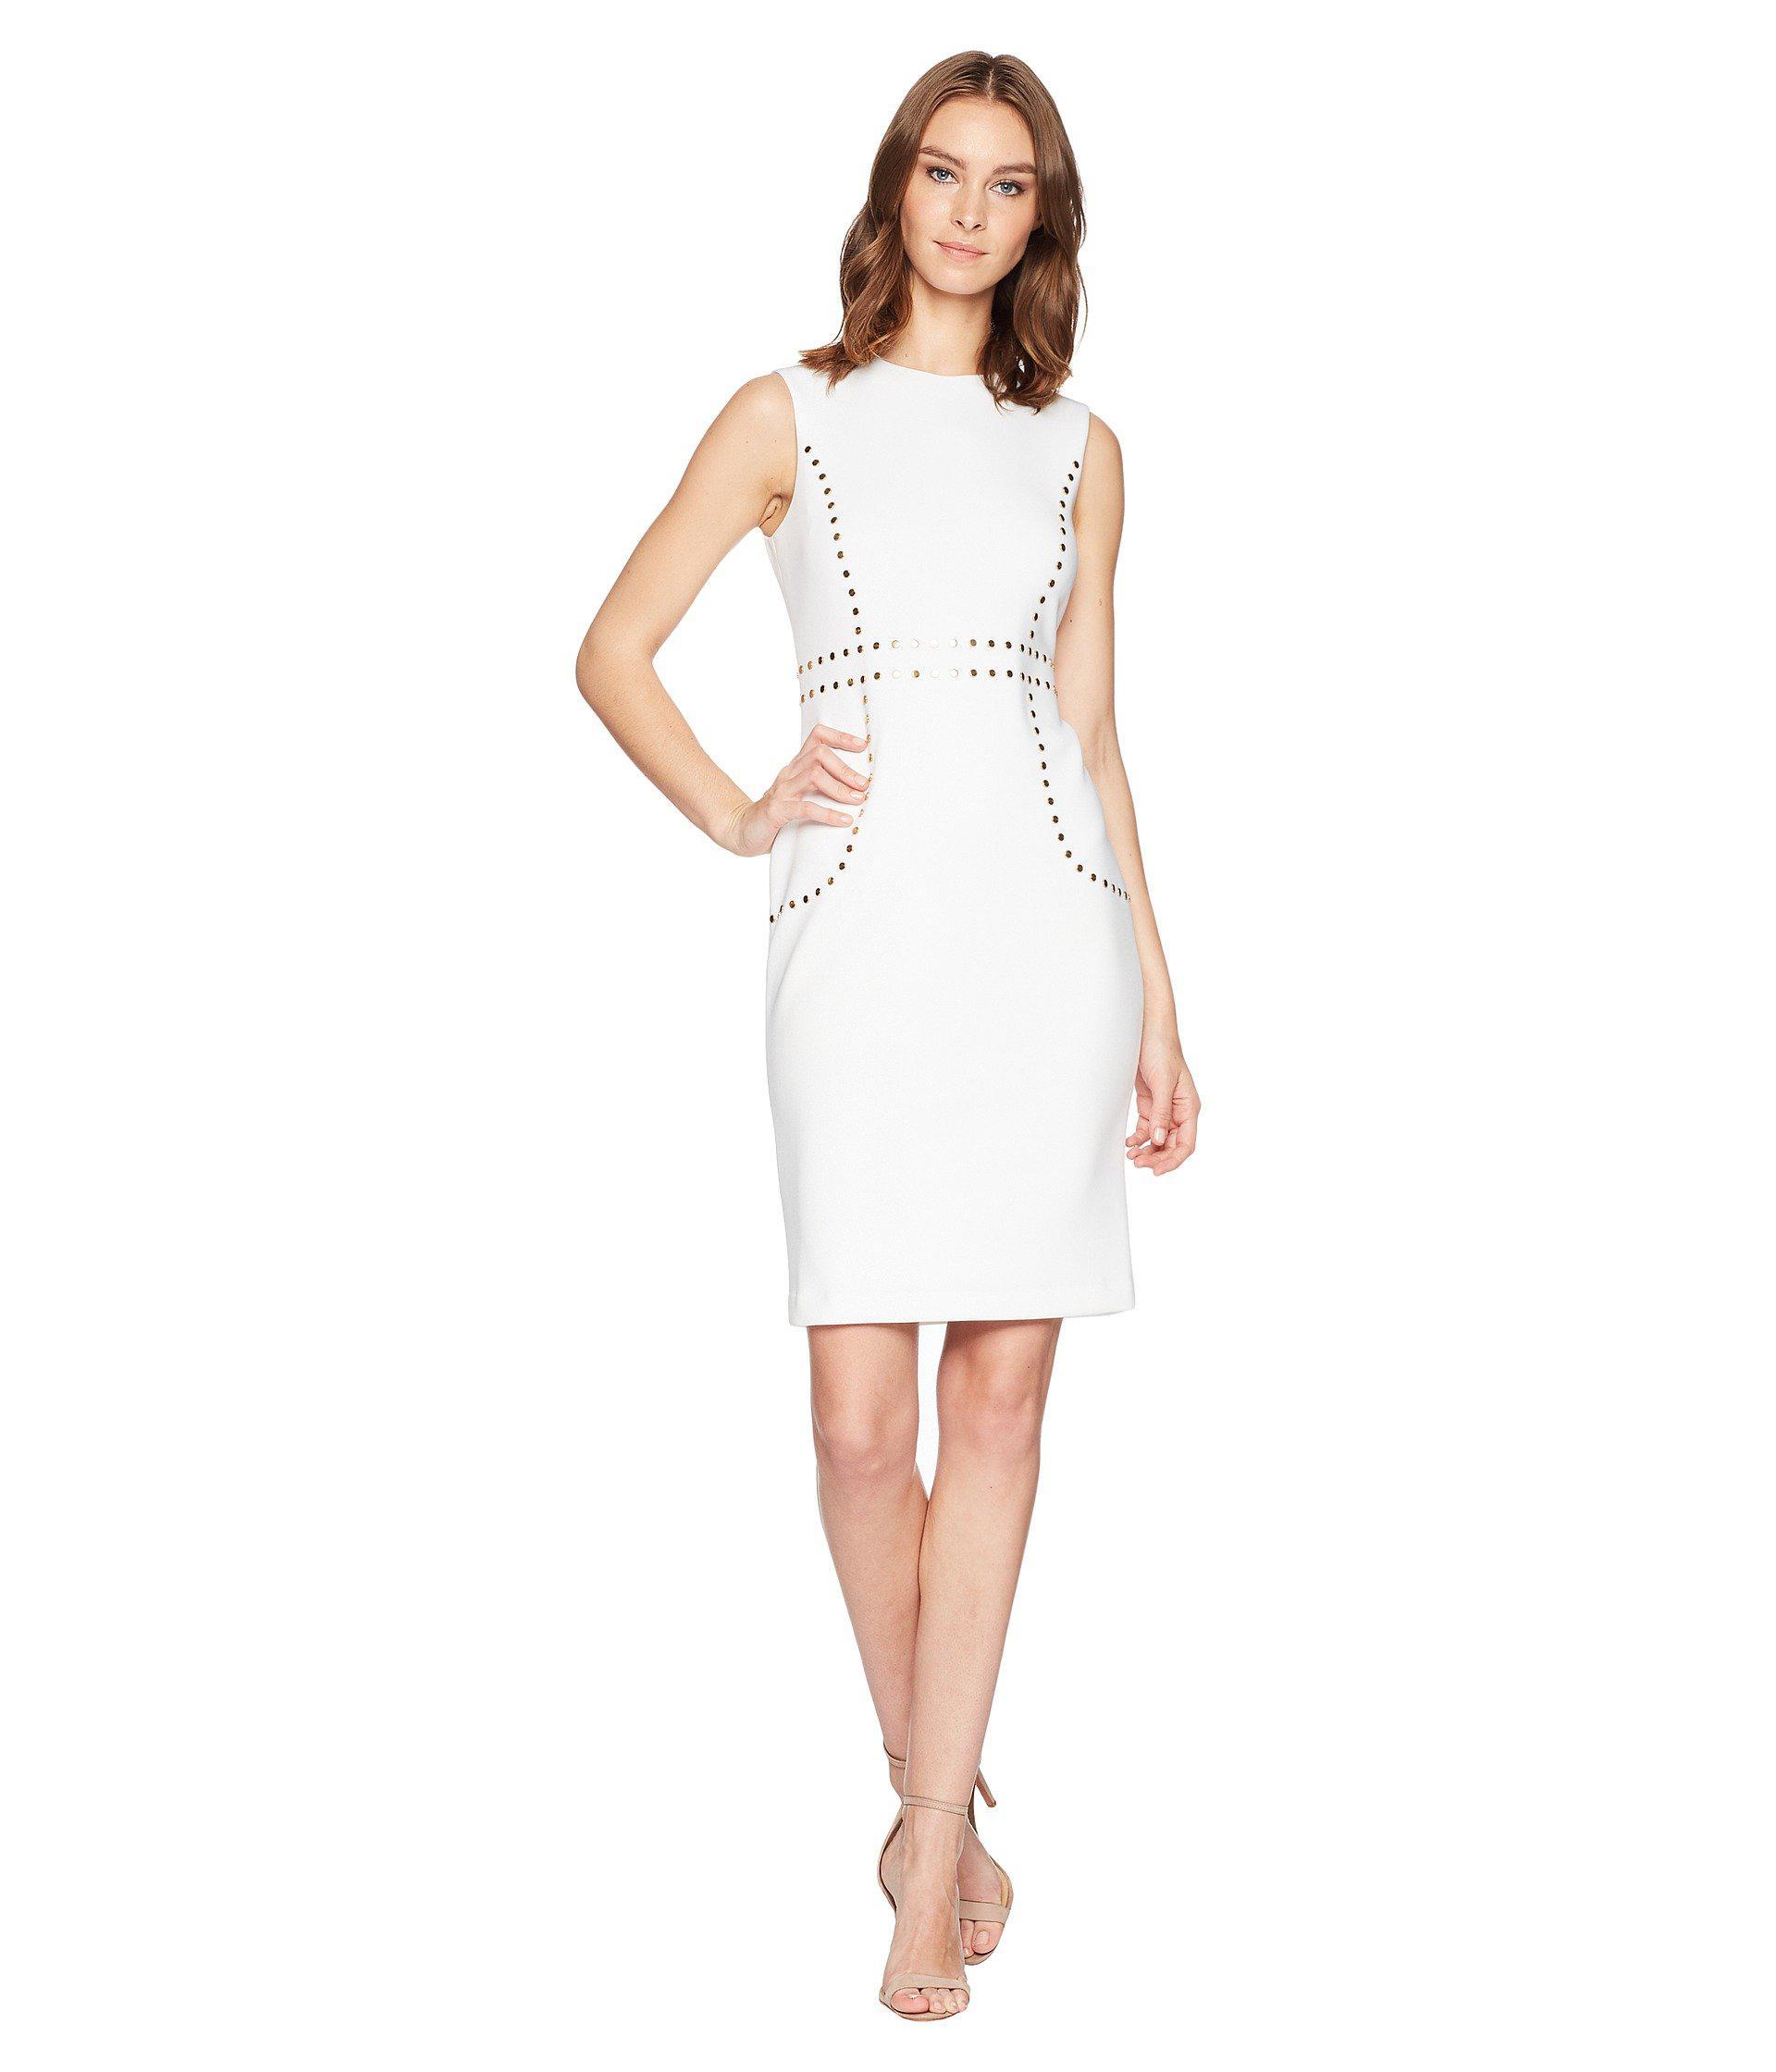 5470fc38c35a Calvin Klein Embellishment Detail Sheath Dress Cd8m15lk in White - Lyst